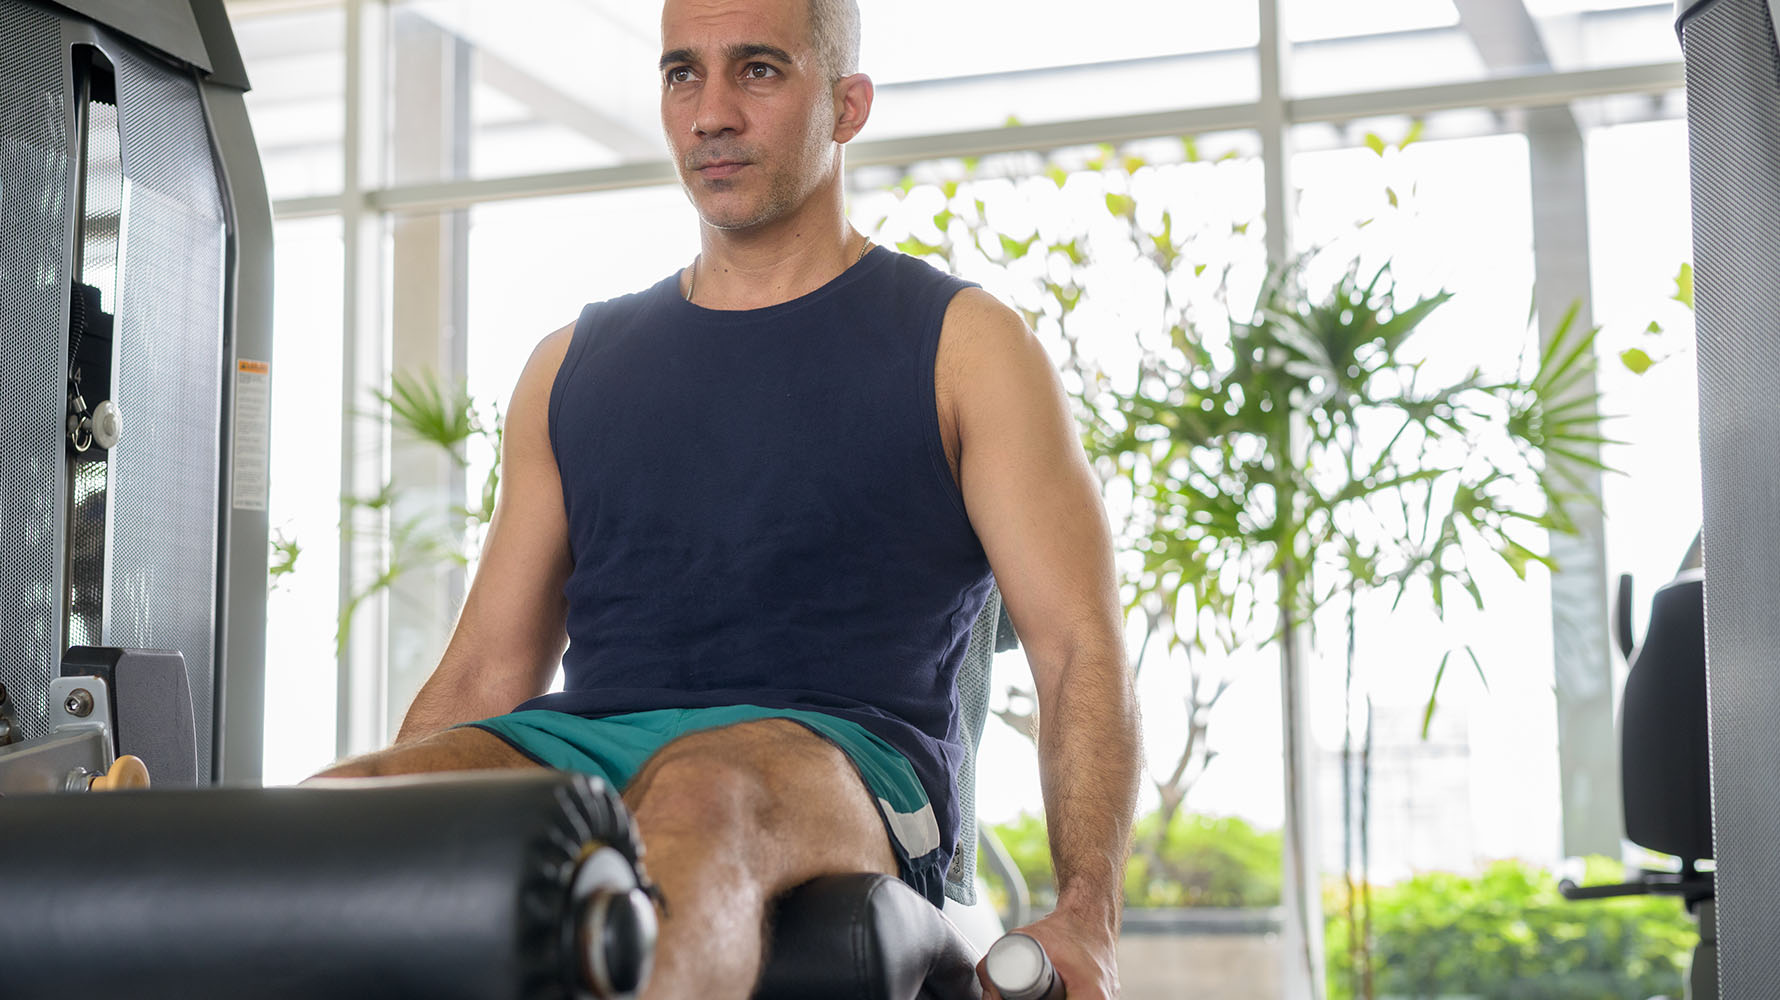 full leg workout routine for men